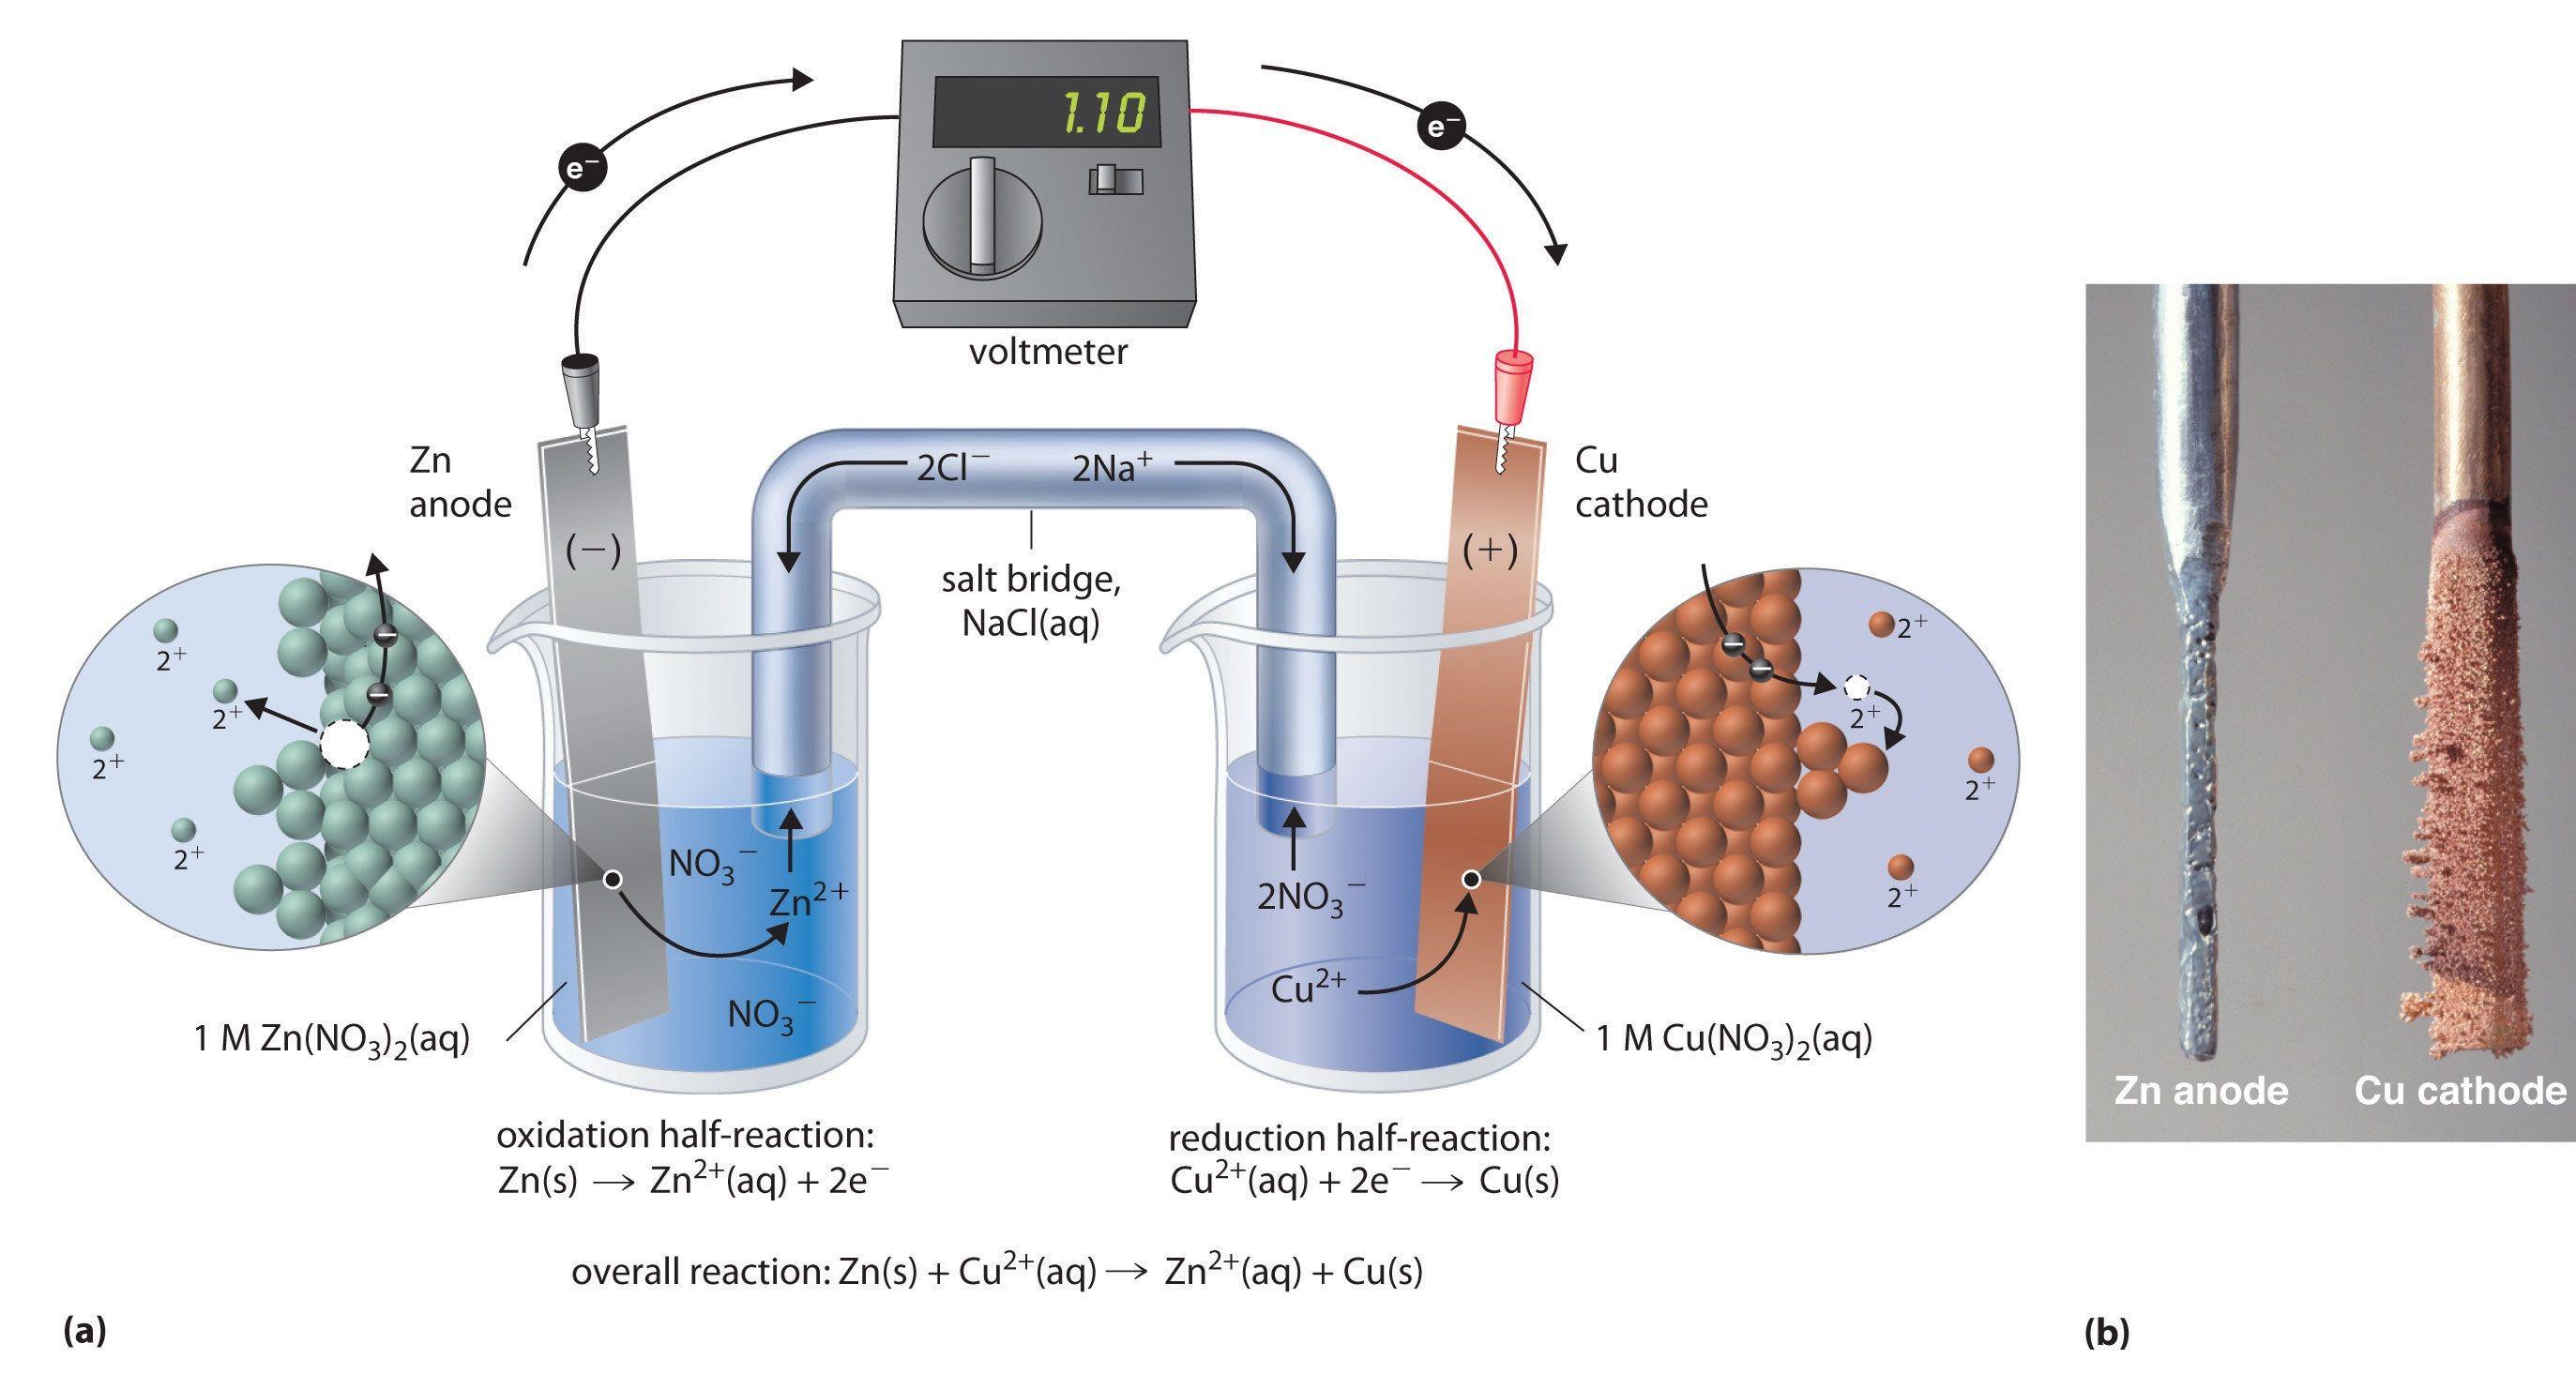 Electrochemical Cells Electrochemistry Chemistry Experiments Environmental Chemistry